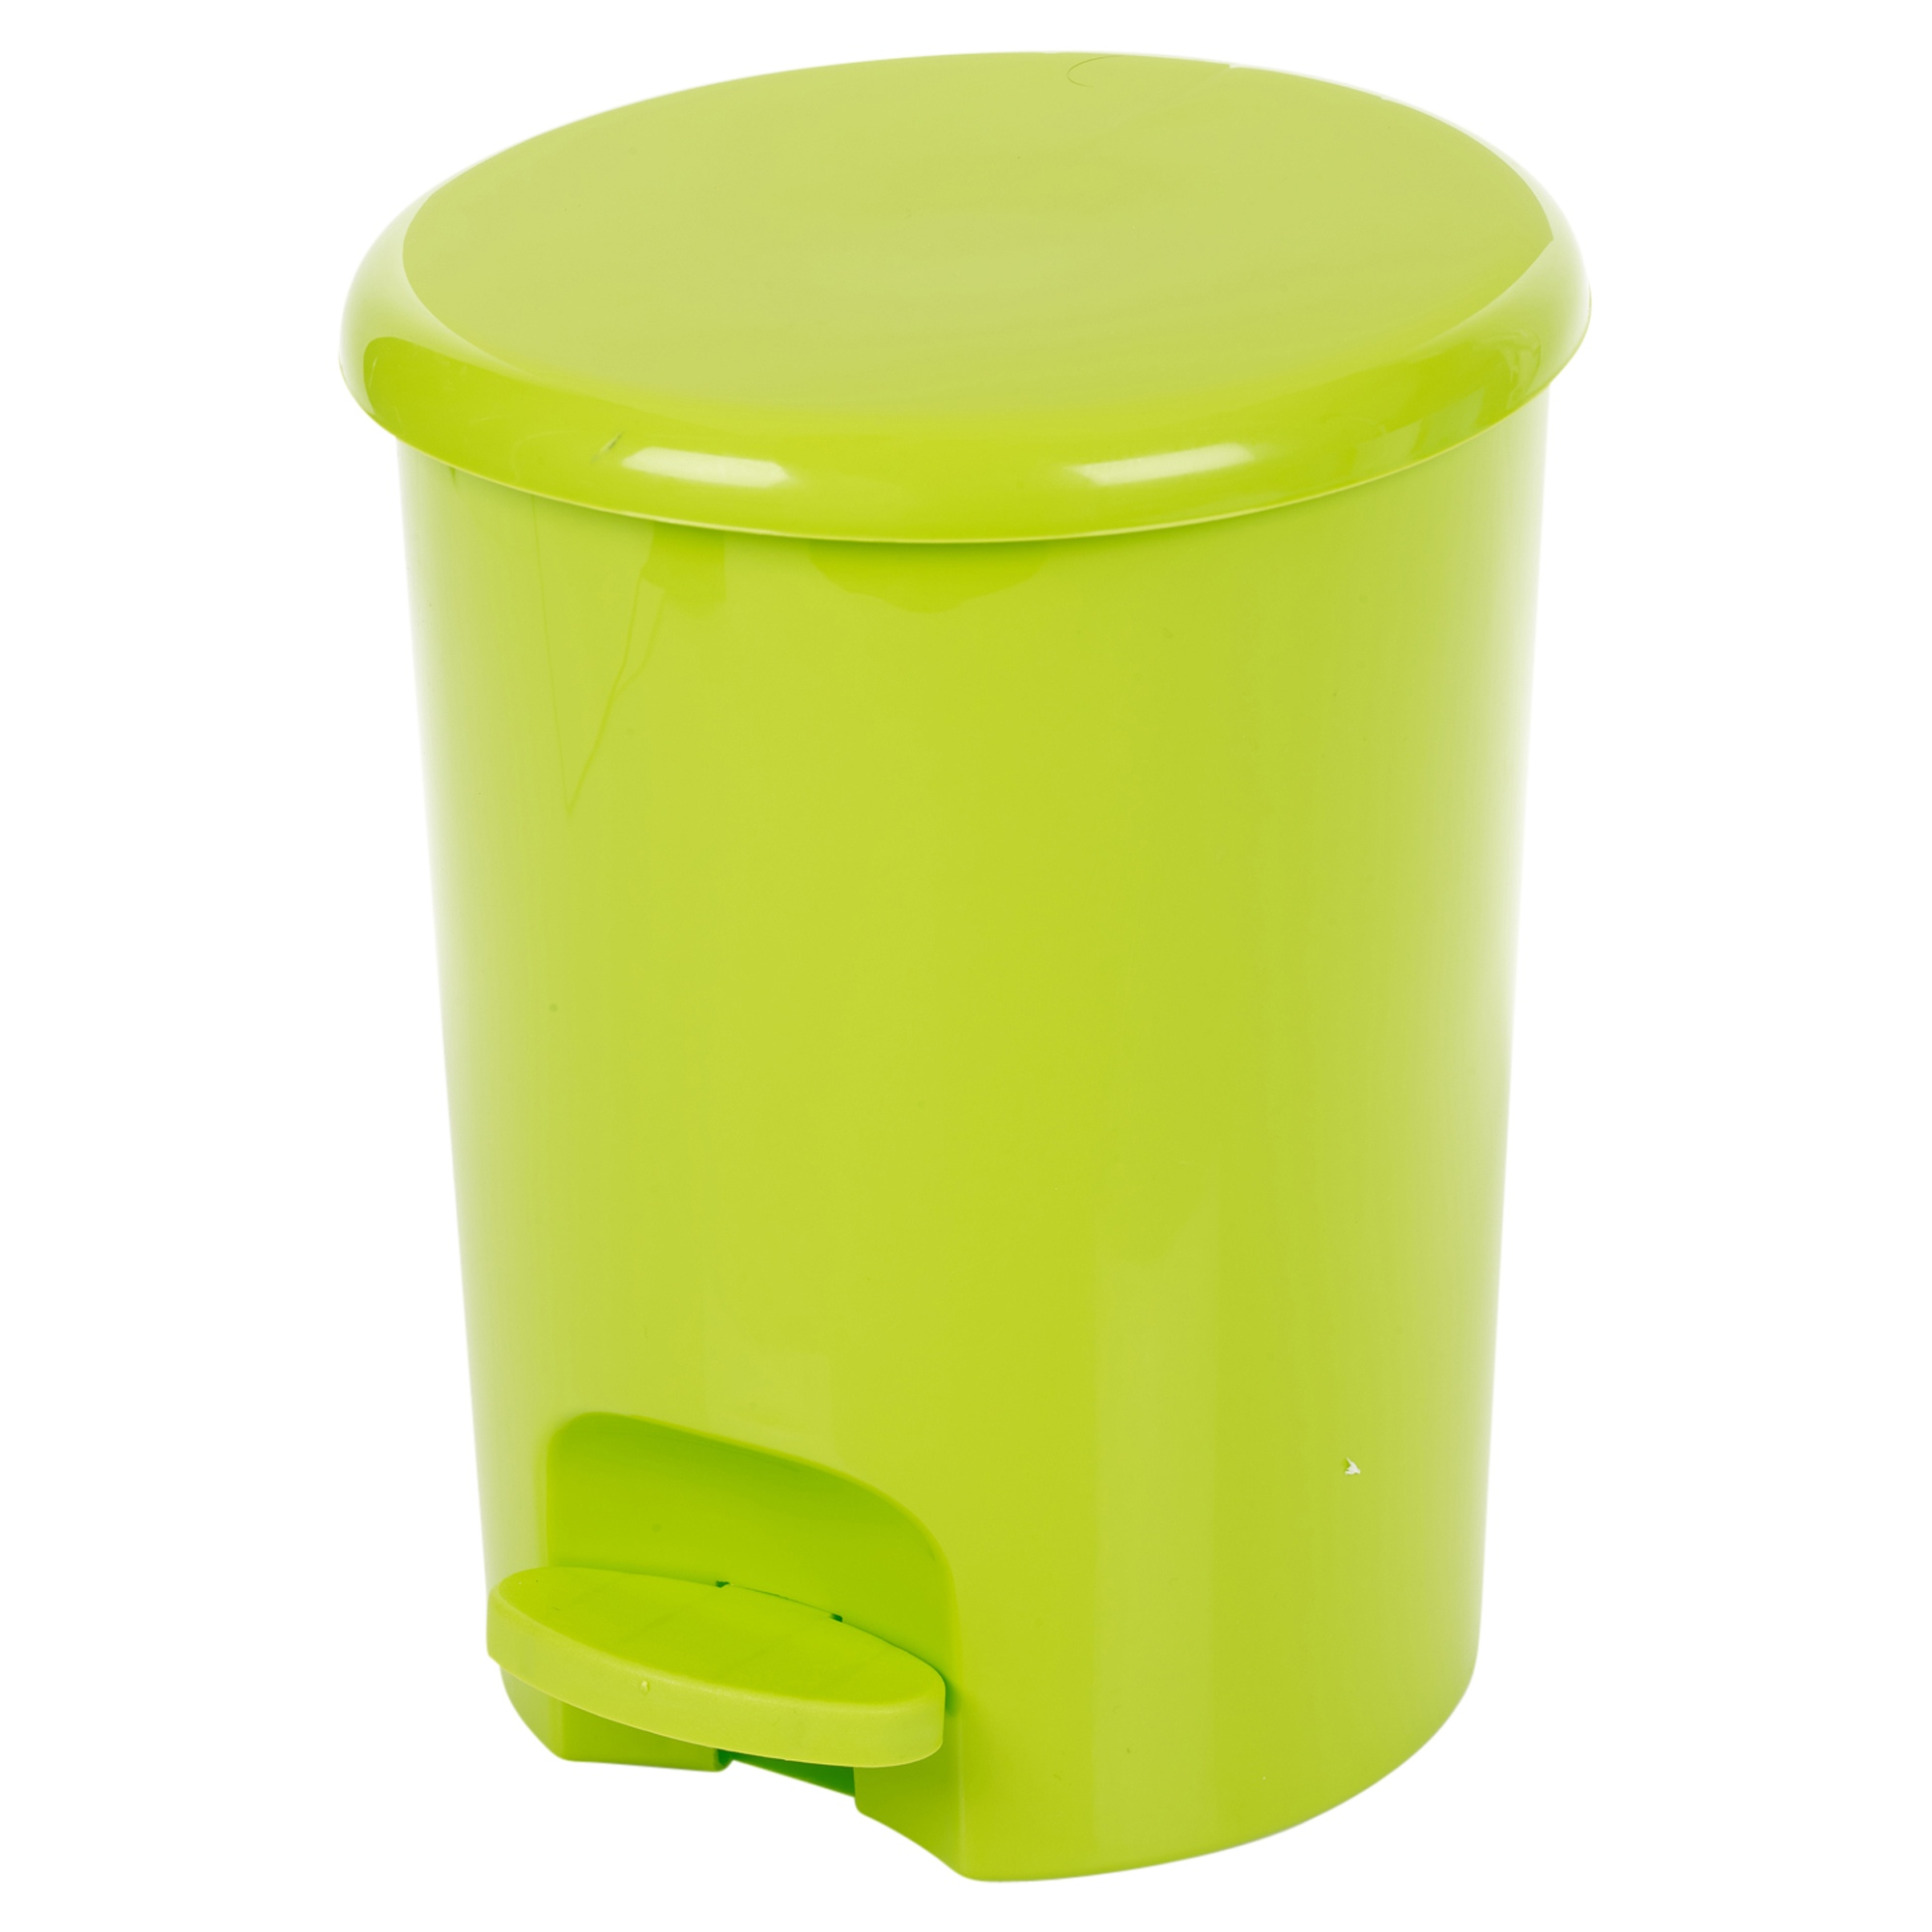 Green Kitchen Bin: Plastic 5 Litre Pedal Operated Waste Dustbin Rubbish Bin